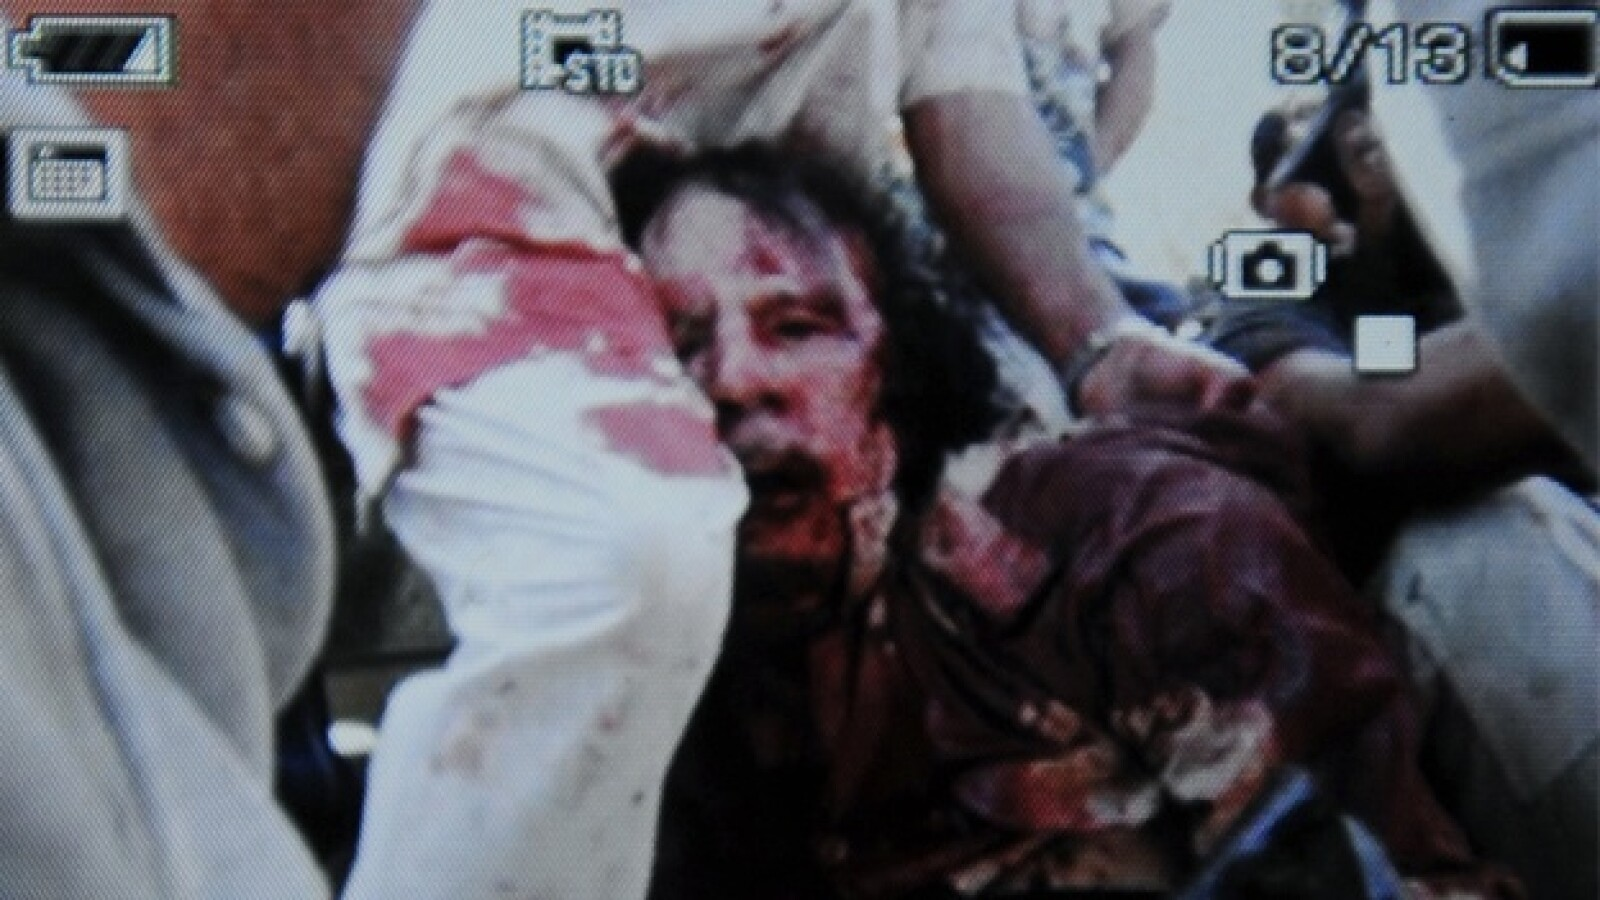 Libia - Gadhafi - muerte